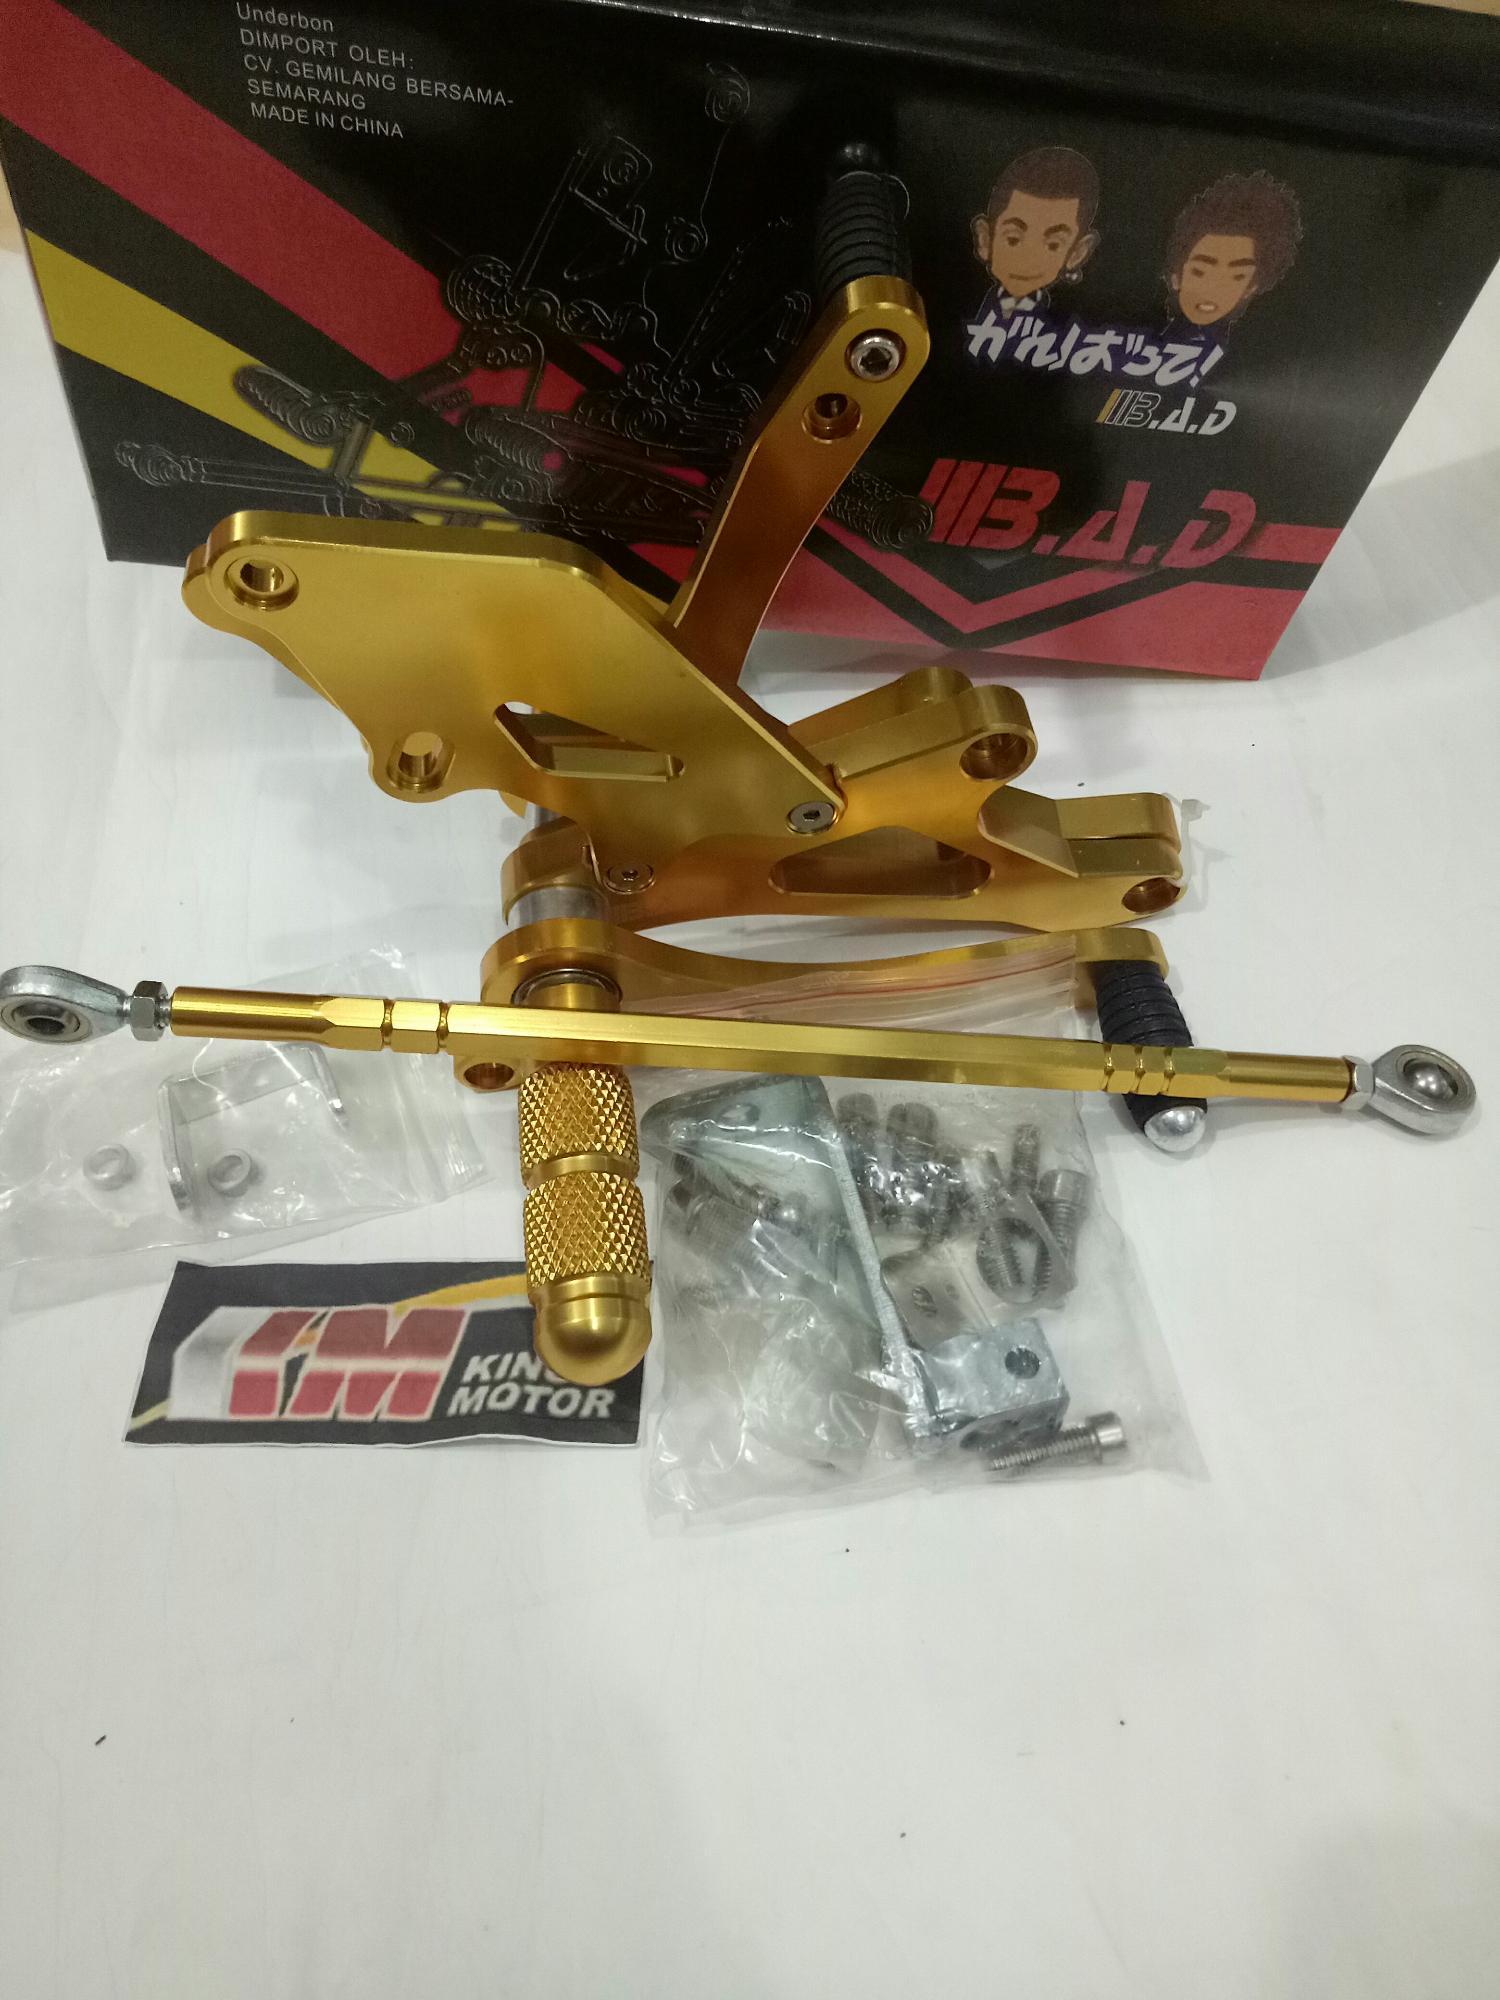 Footstep Underbone Ninja 150 R & RR BAD Gold